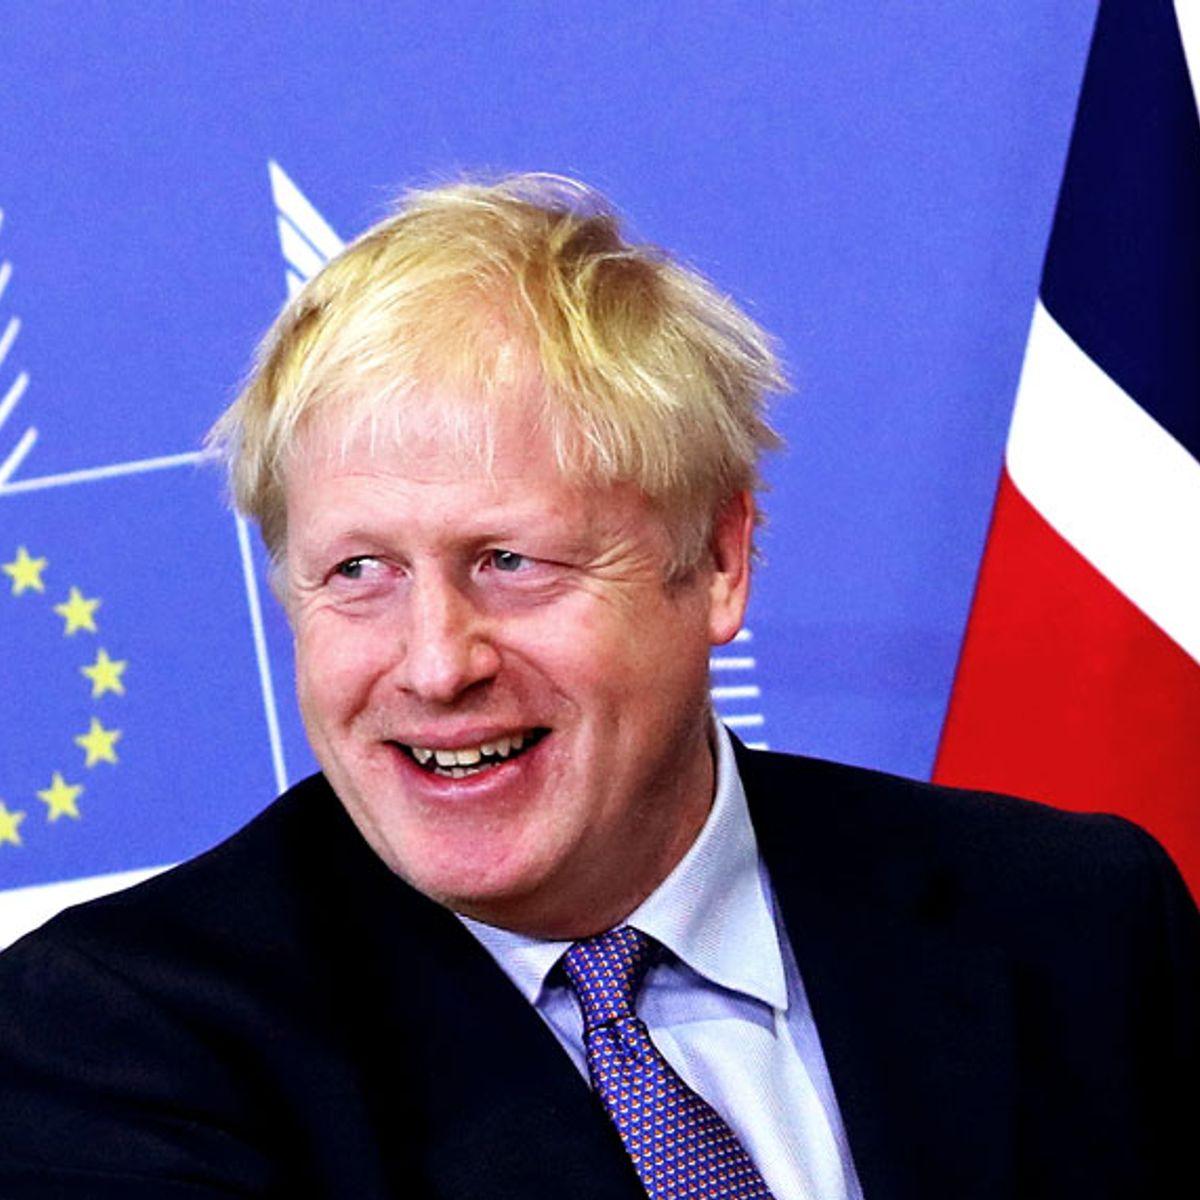 Boris Johnson, EU leaders agree on Brexit deal — now Parliament must vote